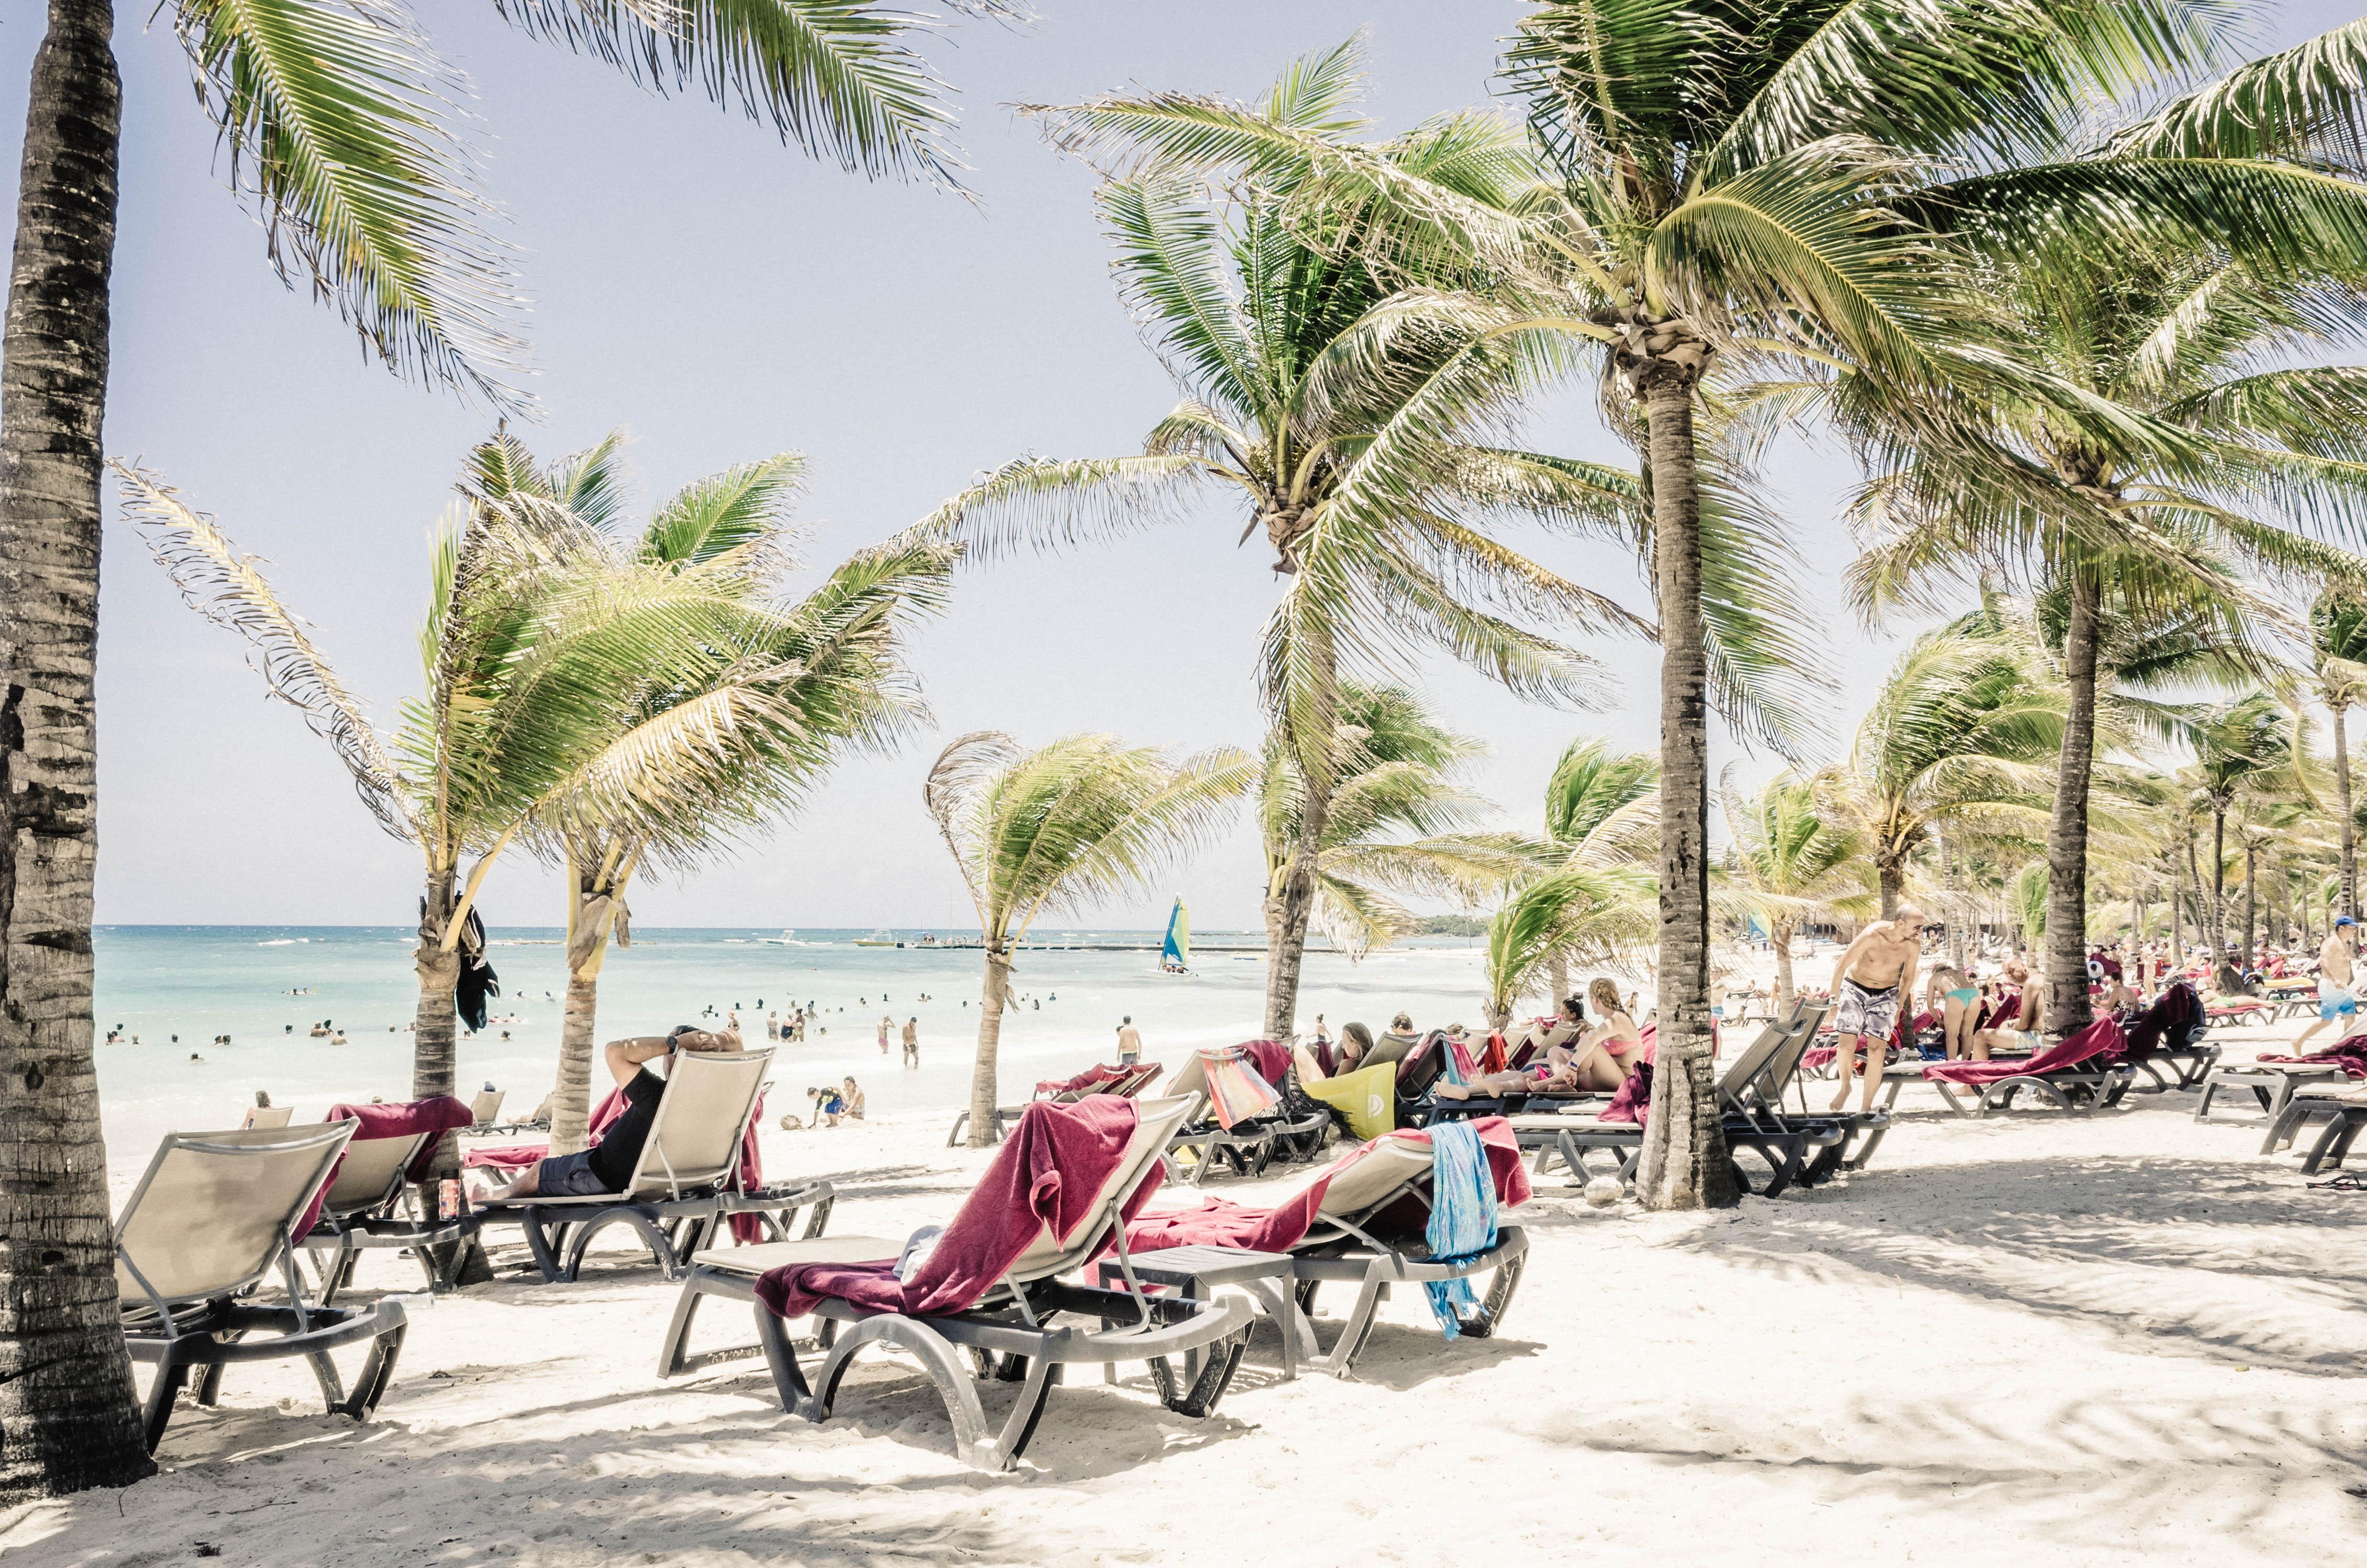 mexico cancun playa del carmen